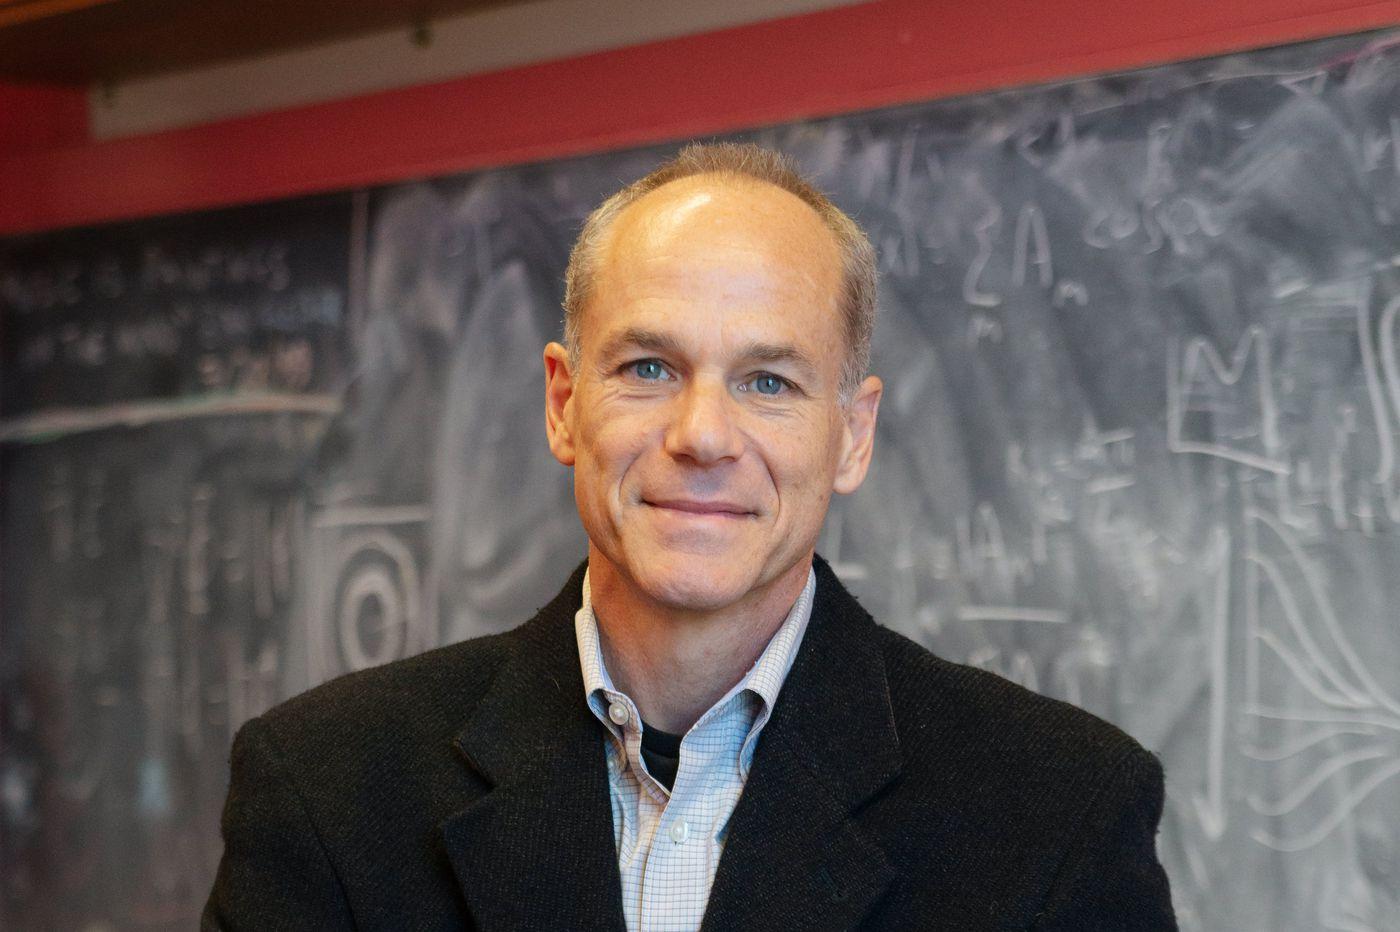 Physicist wins $1.46 million award from West Conshohocken's Templeton Foundation